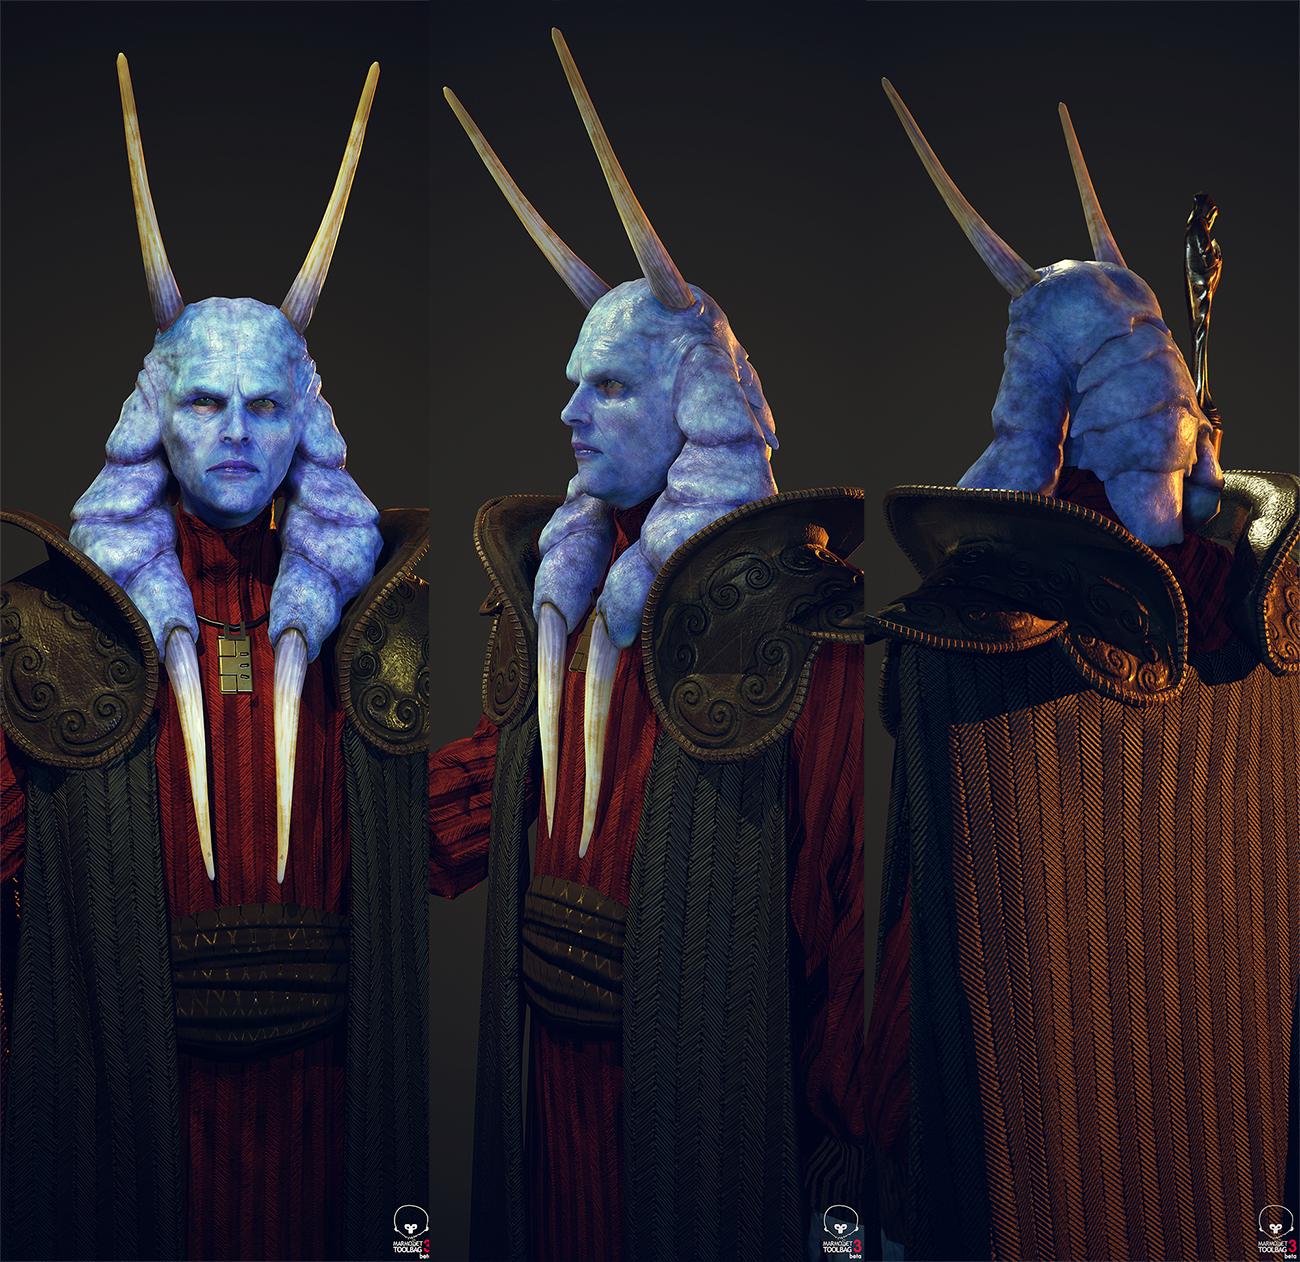 Mas Amedda By Nataliapg Fantasy 3d Cgsociety Последние твиты от mas amedda (@viziermasamedda). mas amedda by nataliapg fantasy 3d